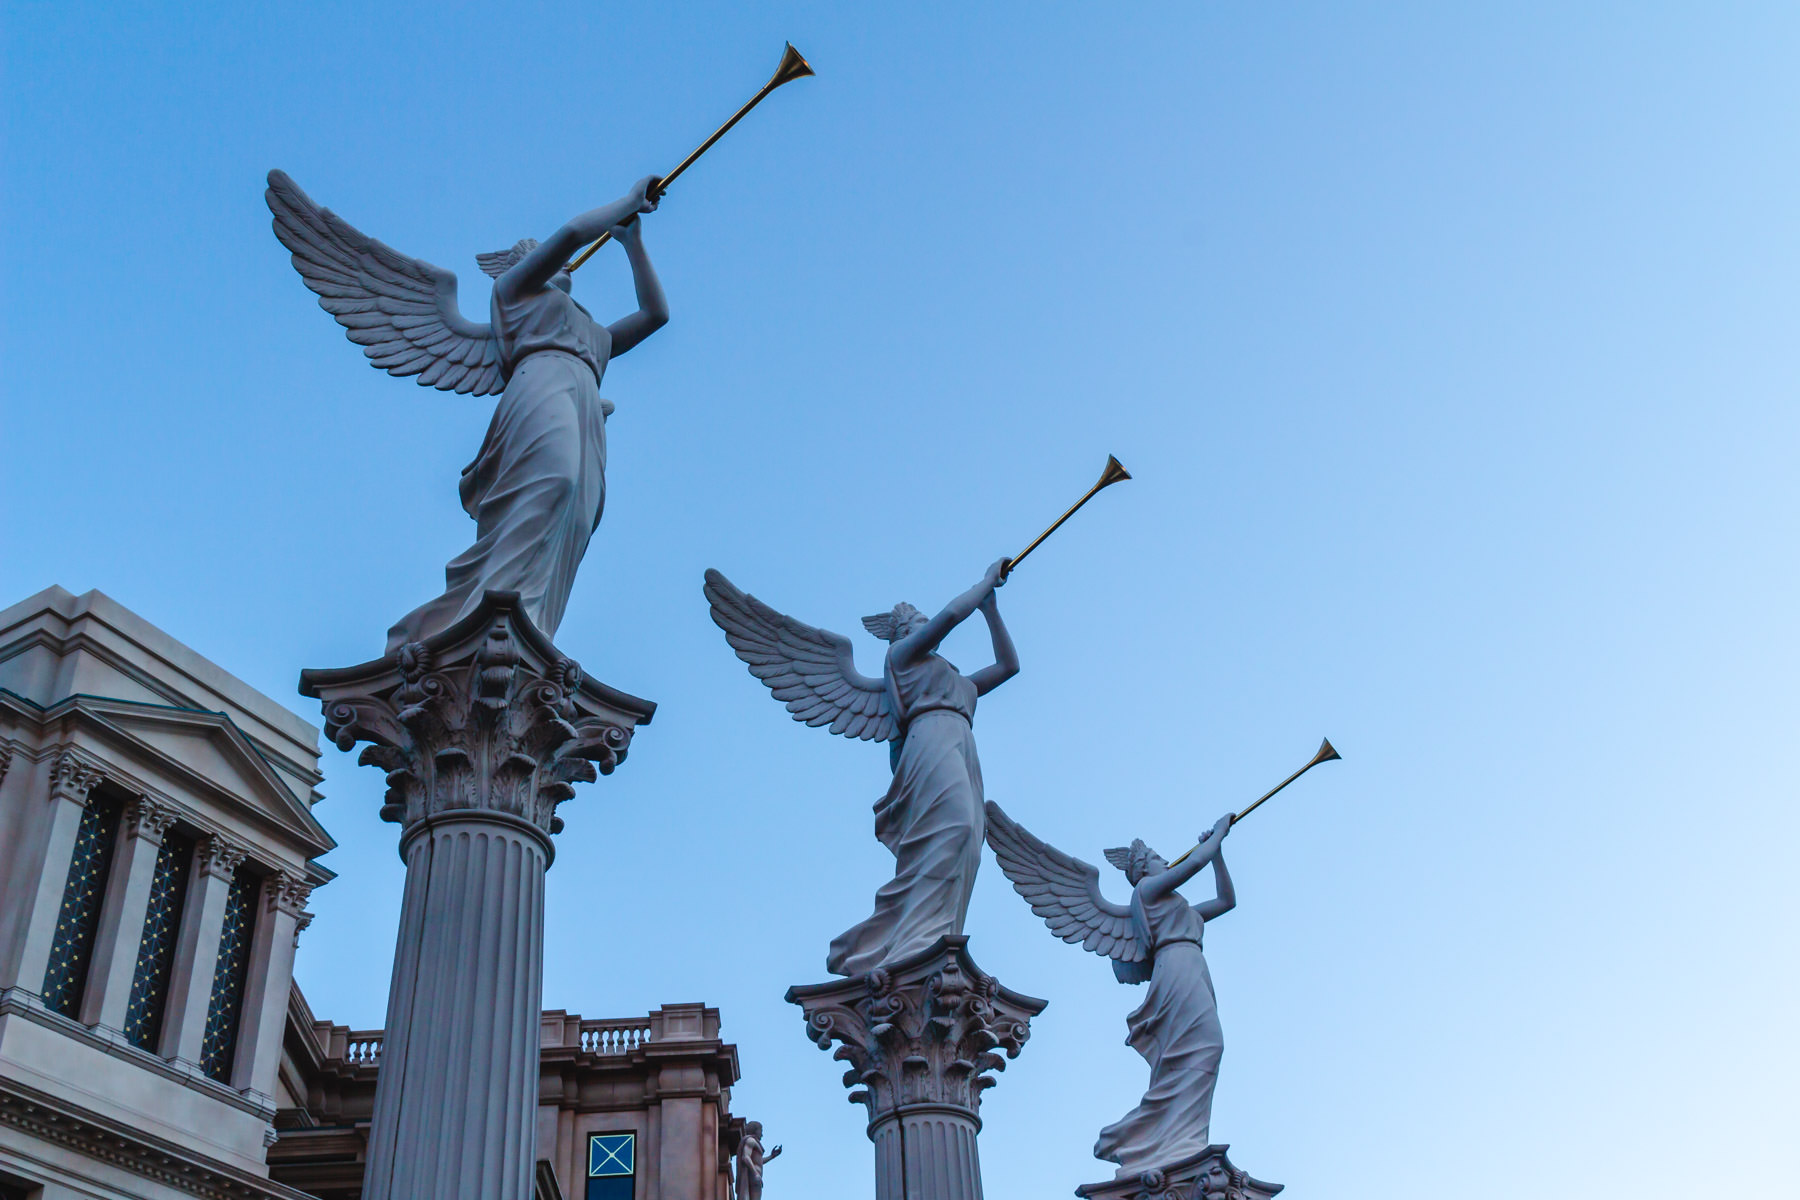 Statues at Caesars Palace, Las Vegas.